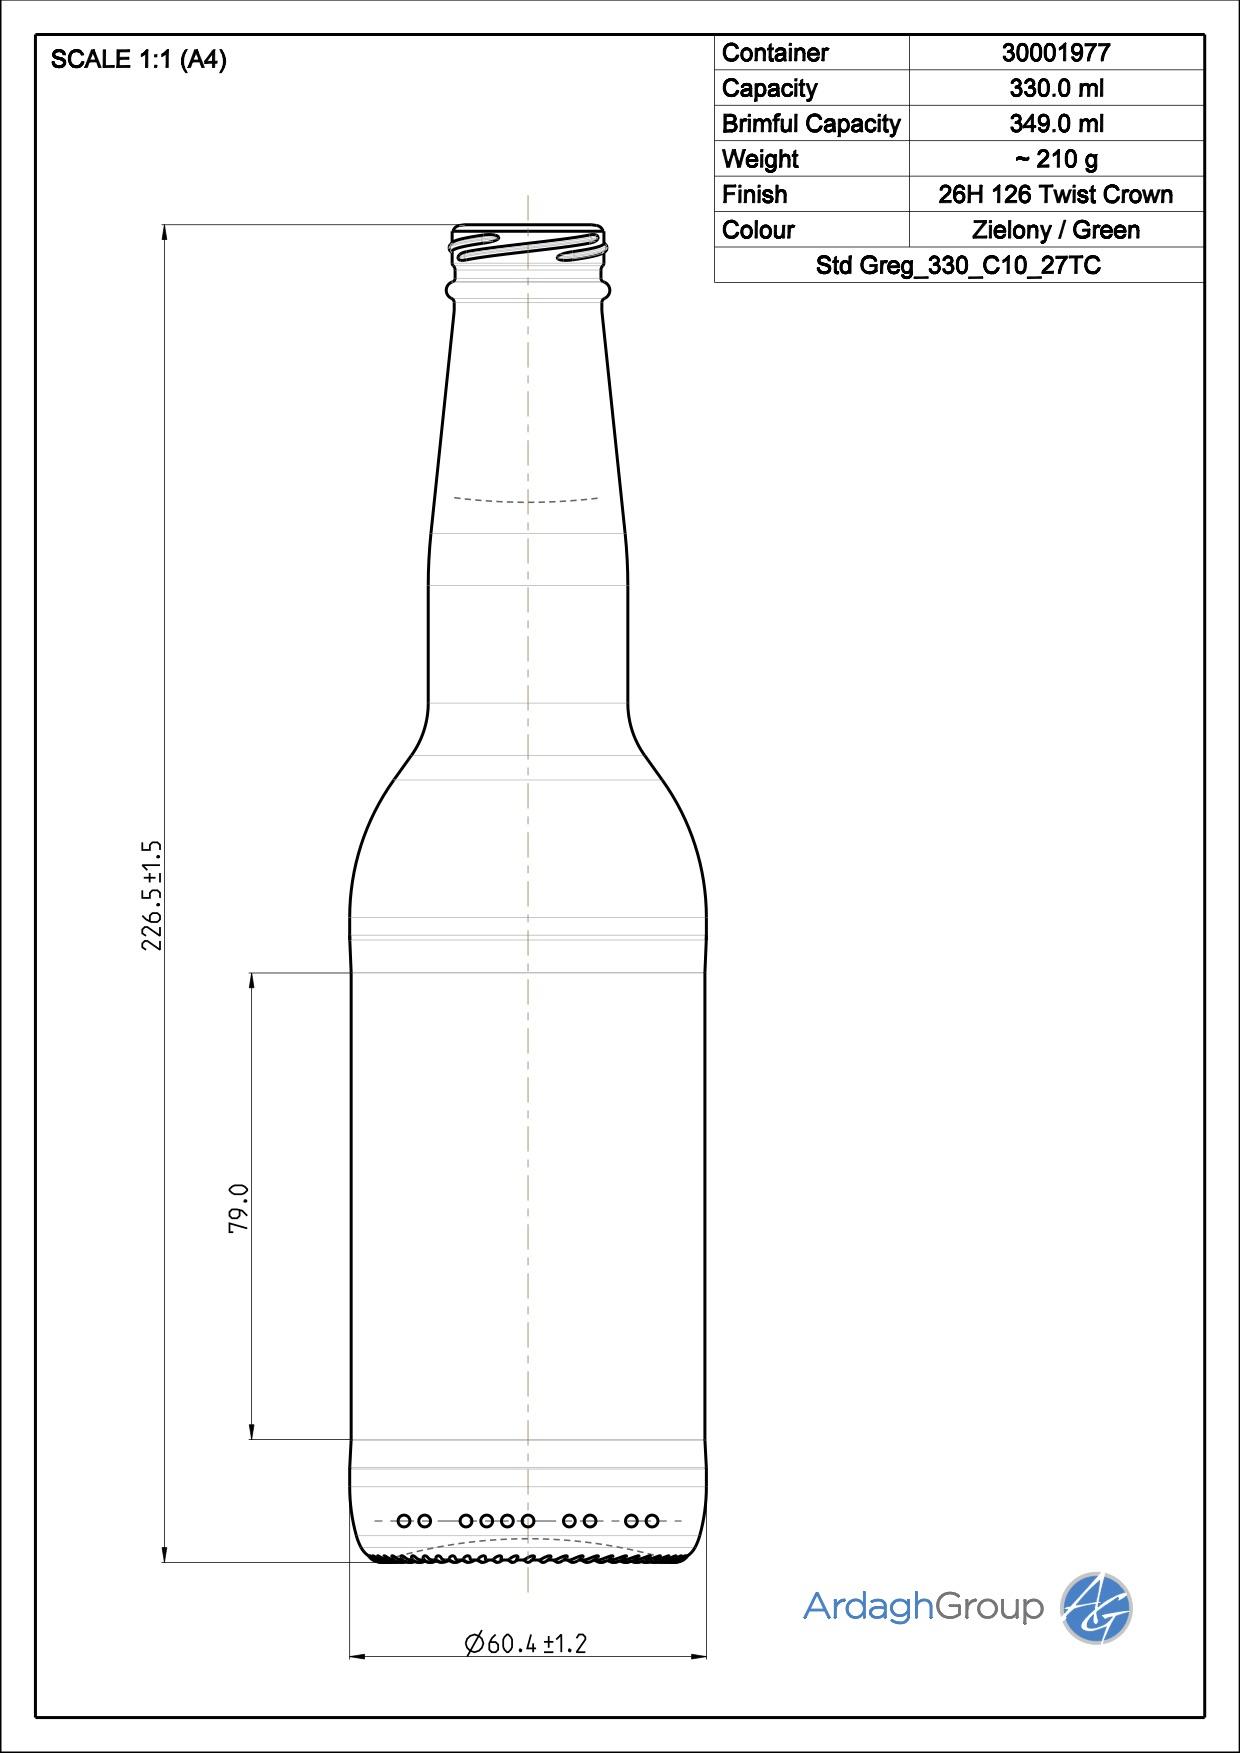 330ml green glass Greg oneway beer bottle